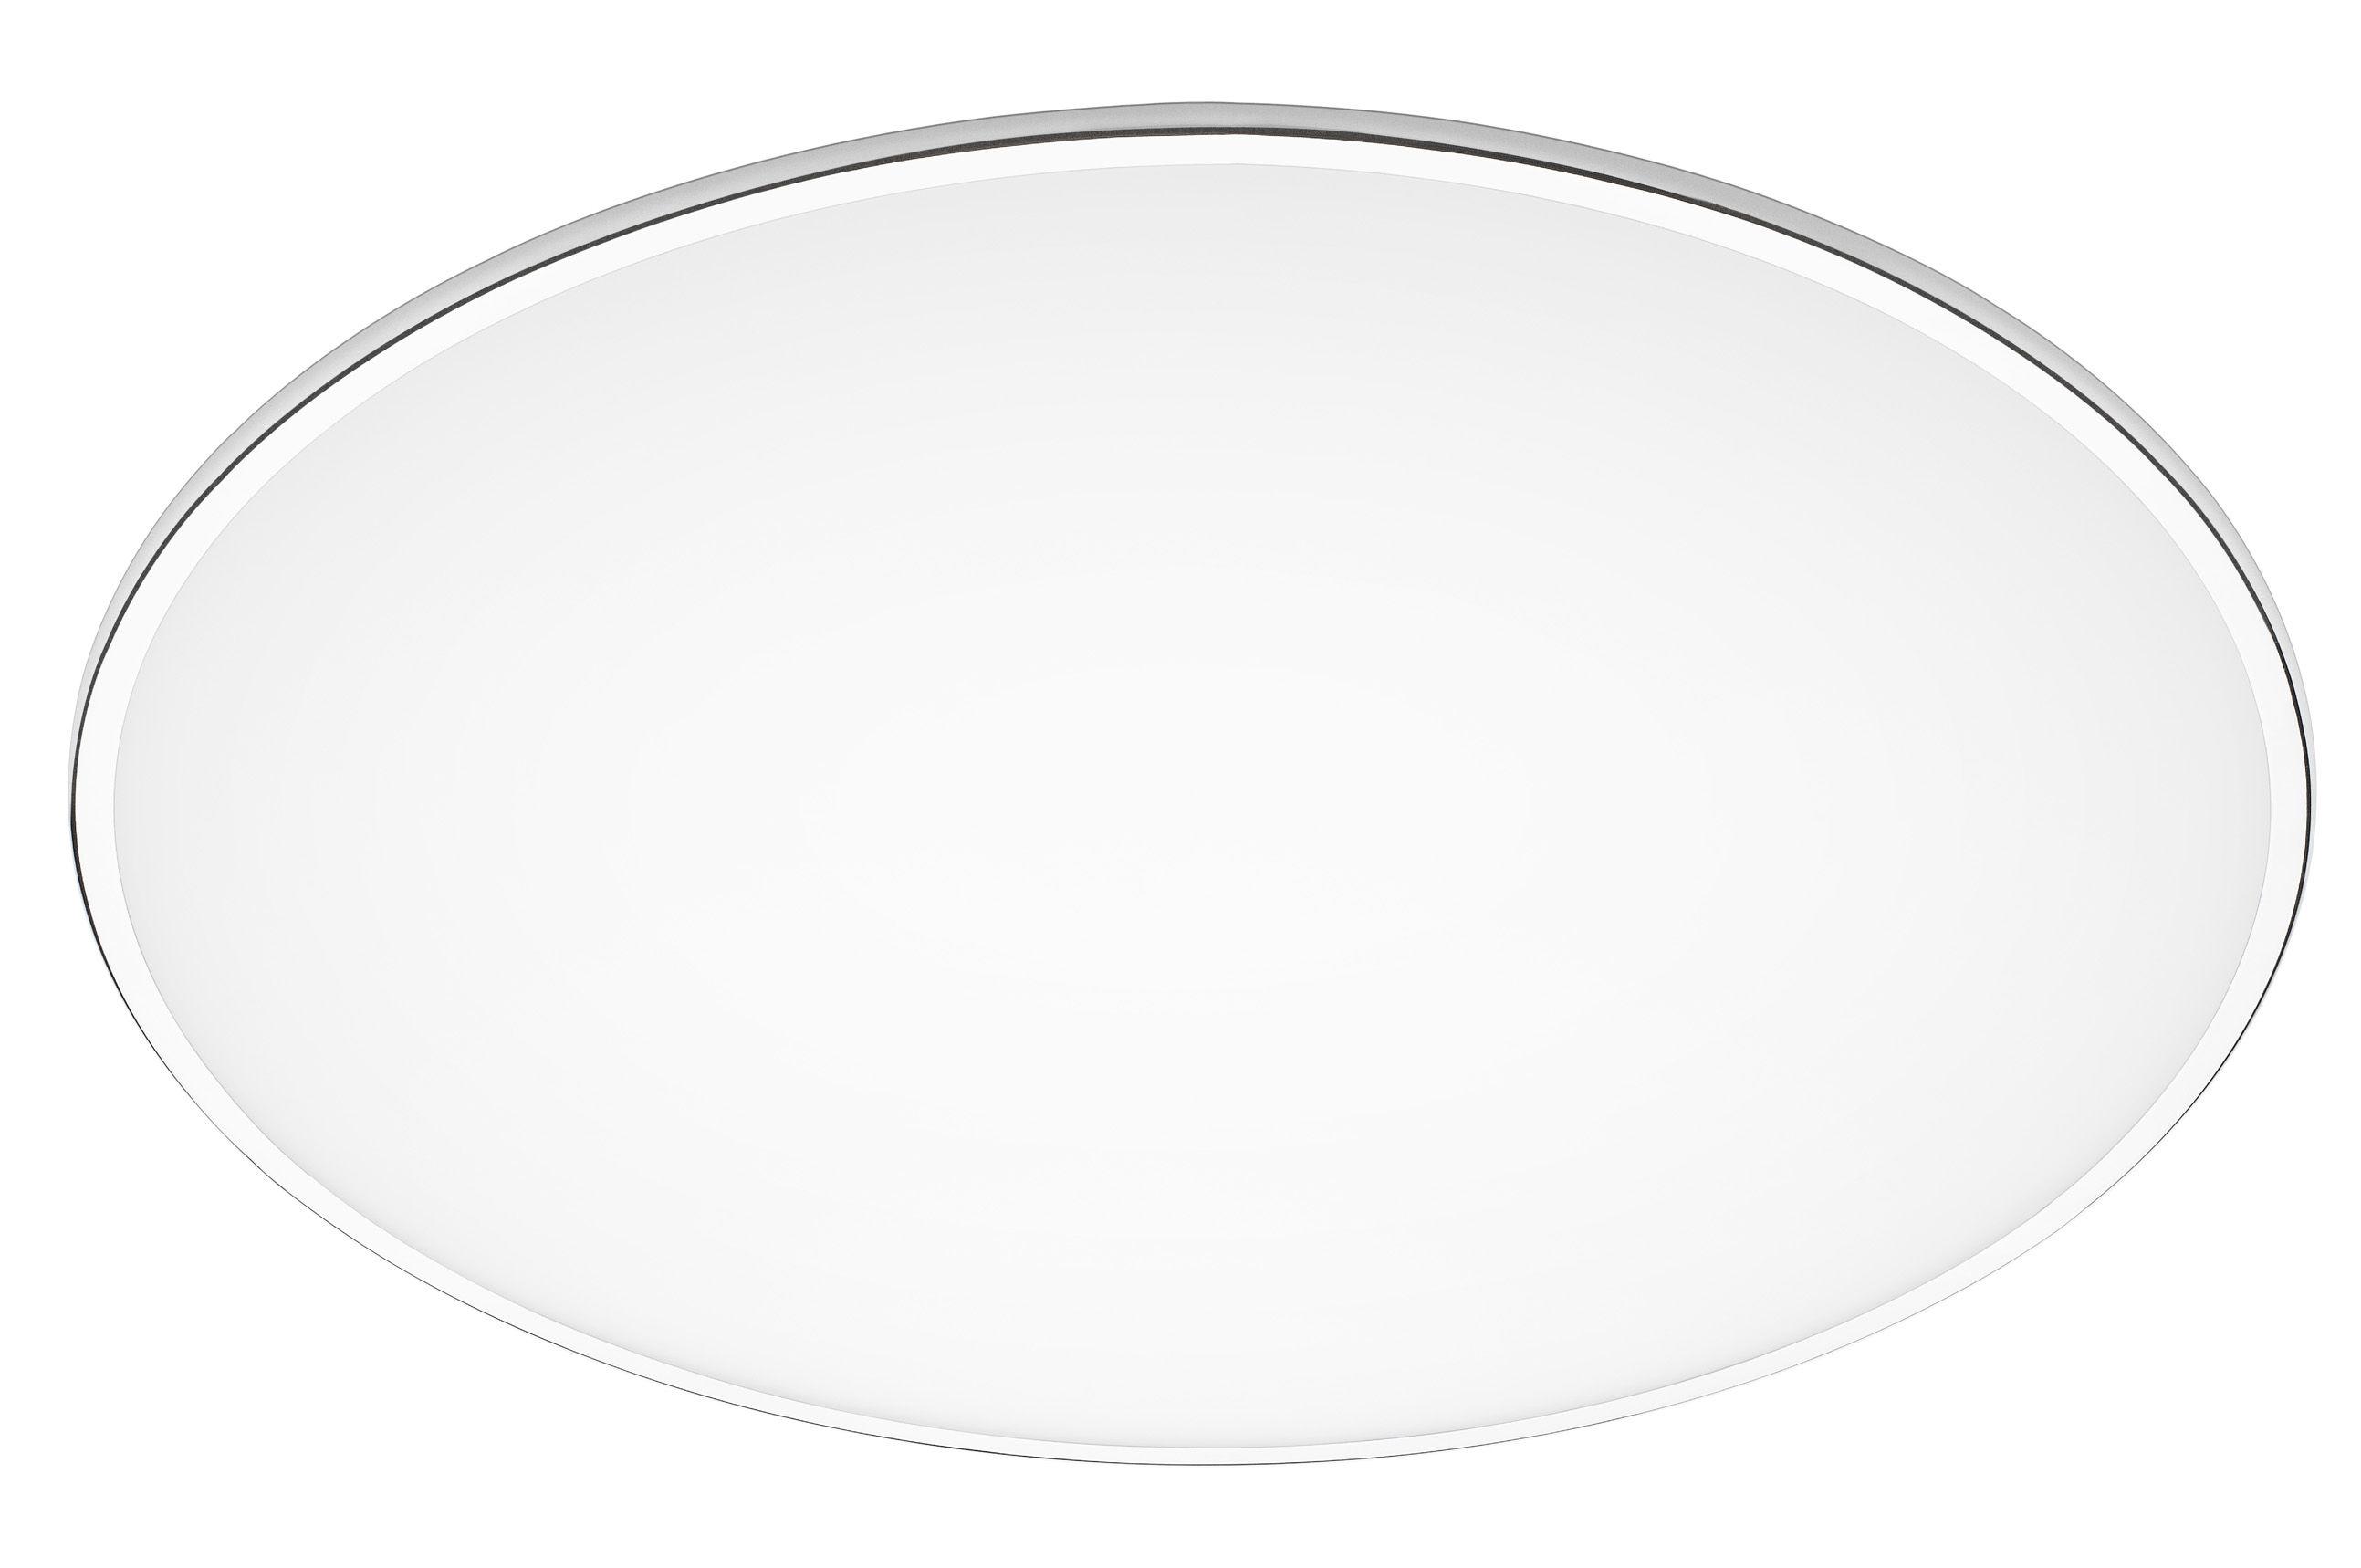 Illuminazione - Plafoniere - Plafoniera Big - / Ø 100 cm di Vibia - Bianco - Alluminio, Méthacrylate opalin